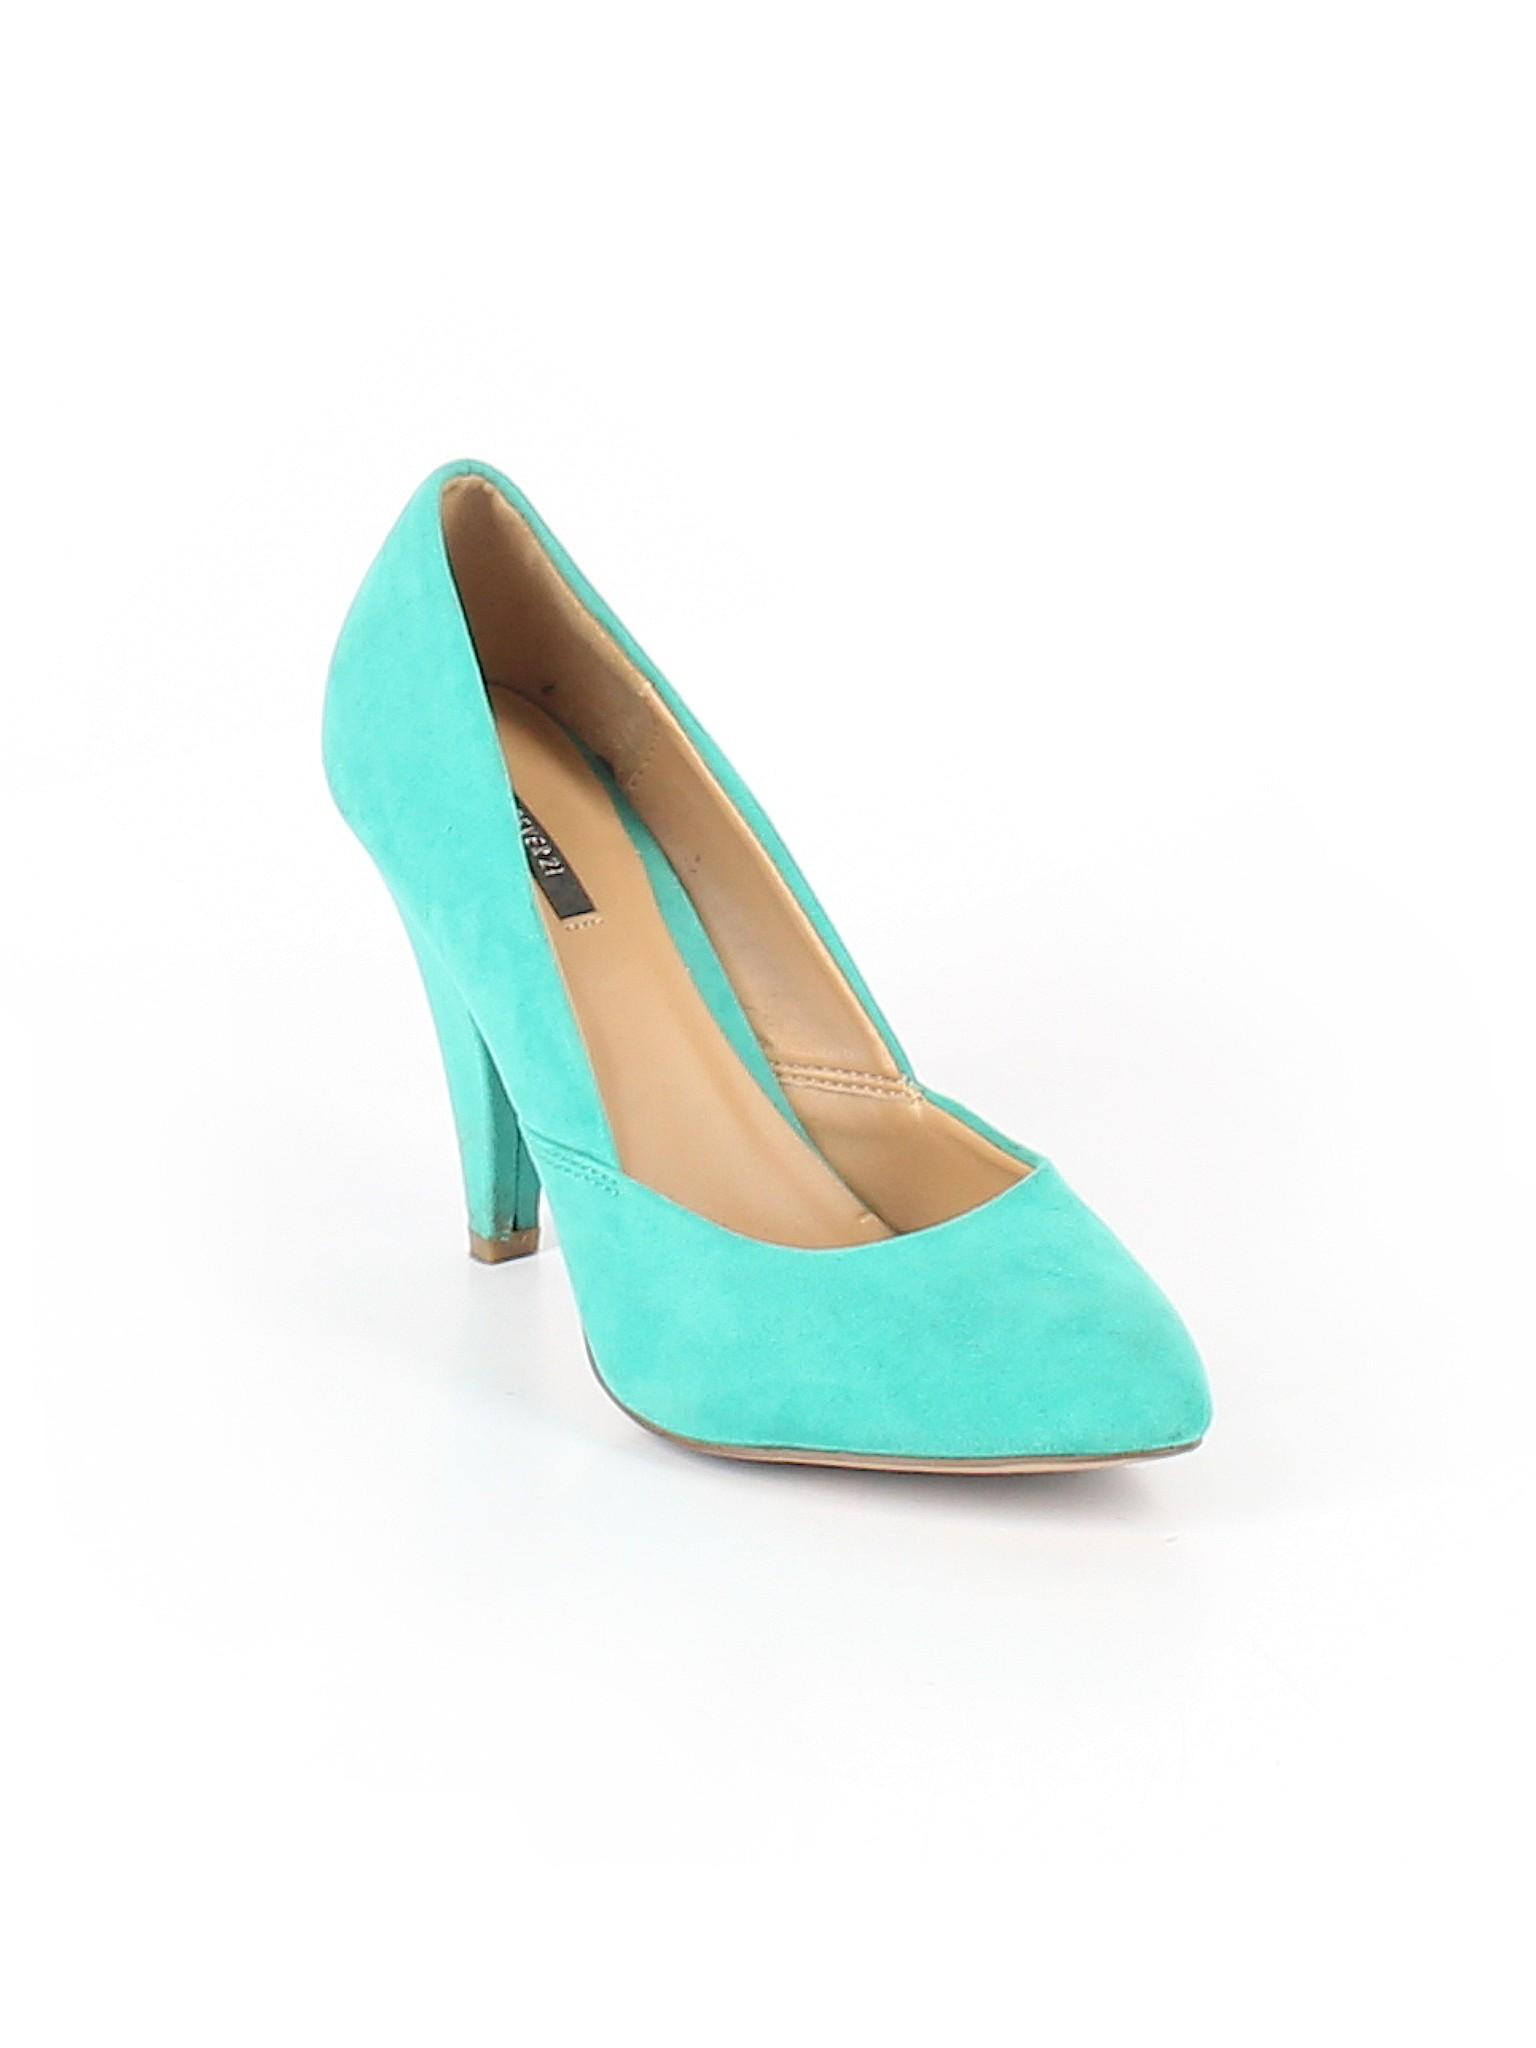 Boutique Heels 21 promotion promotion Boutique Forever OqO067